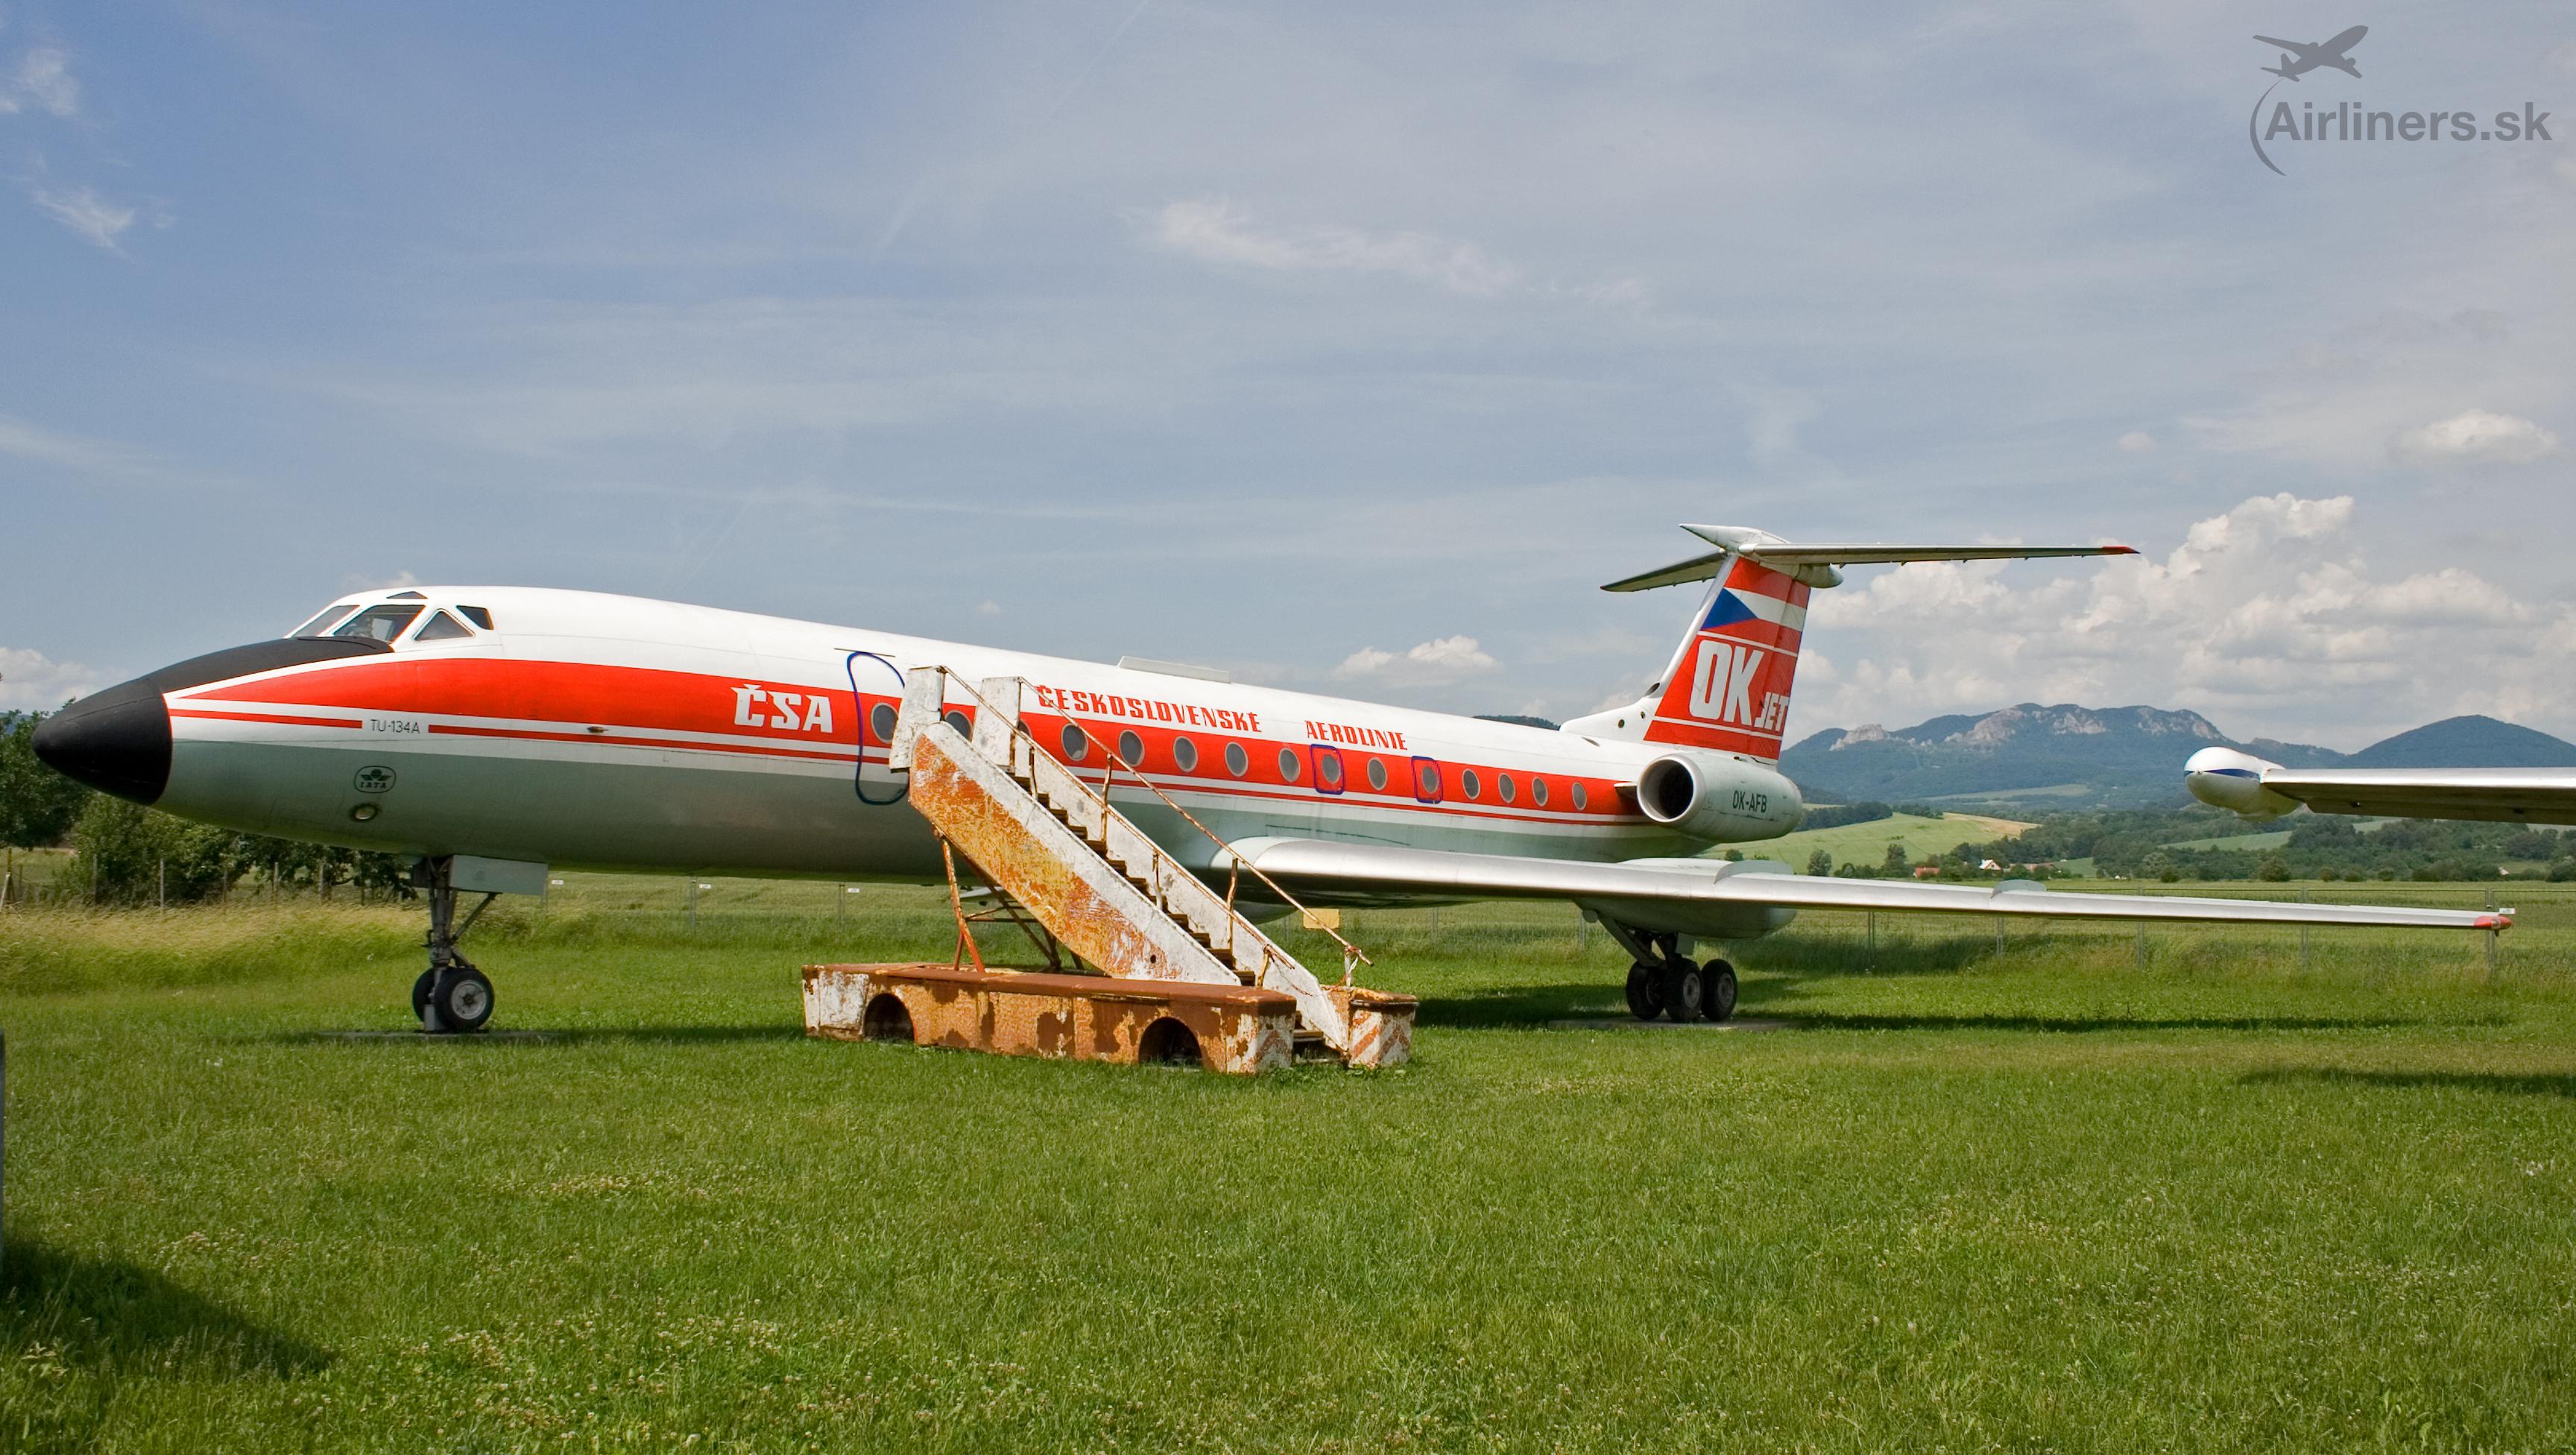 Tupolev Tu-134, OK-AFB